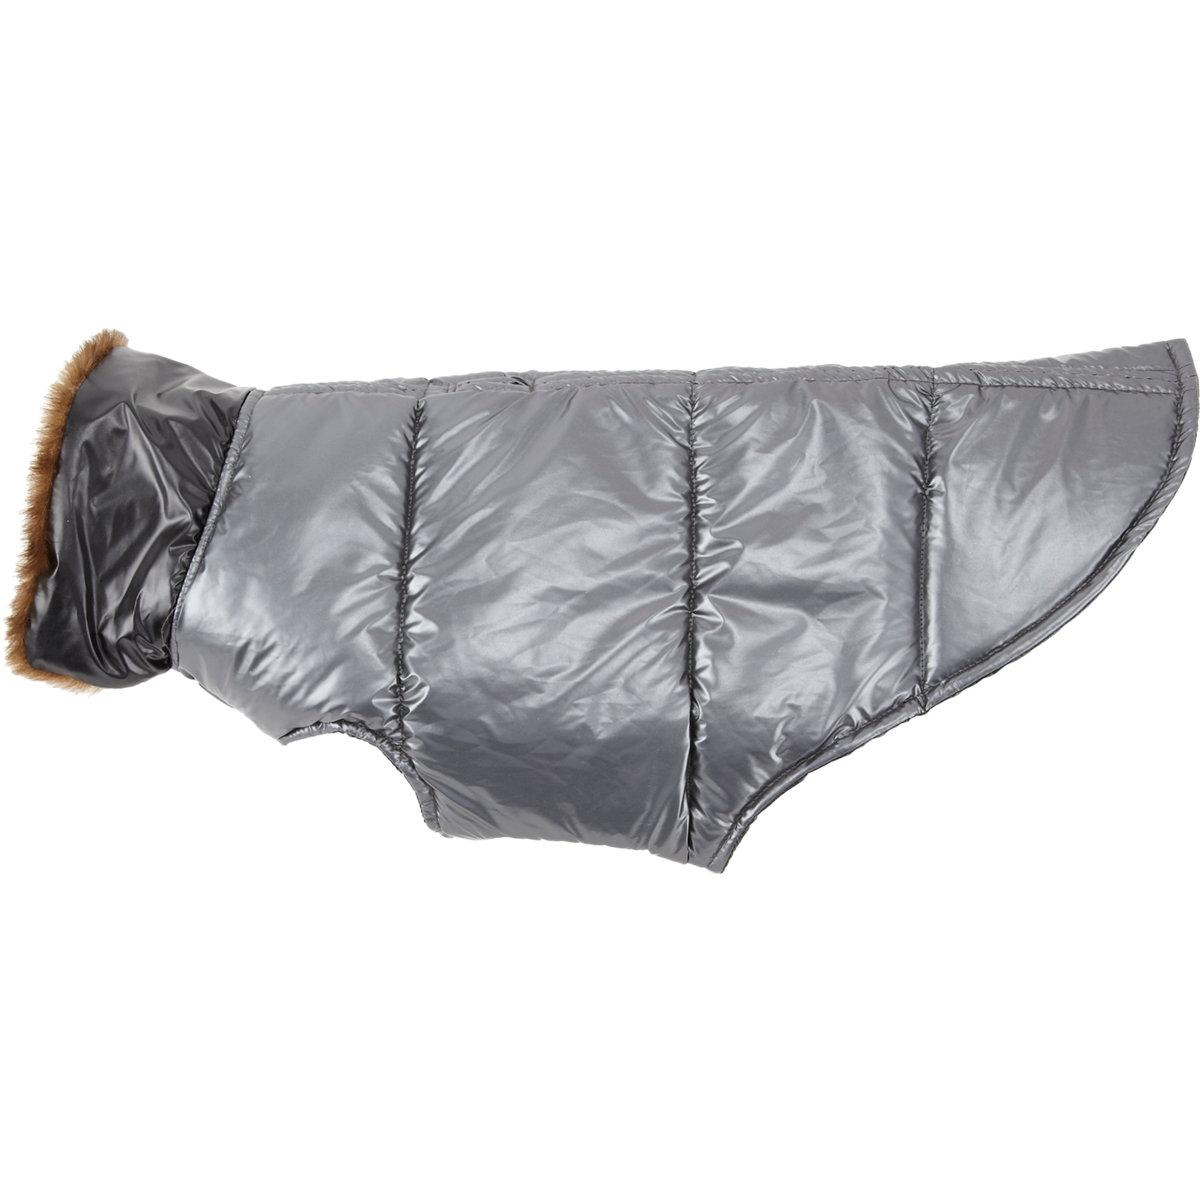 BARNEYS NEW YORK Metallic Puffer Dog Coat  $75 Sale